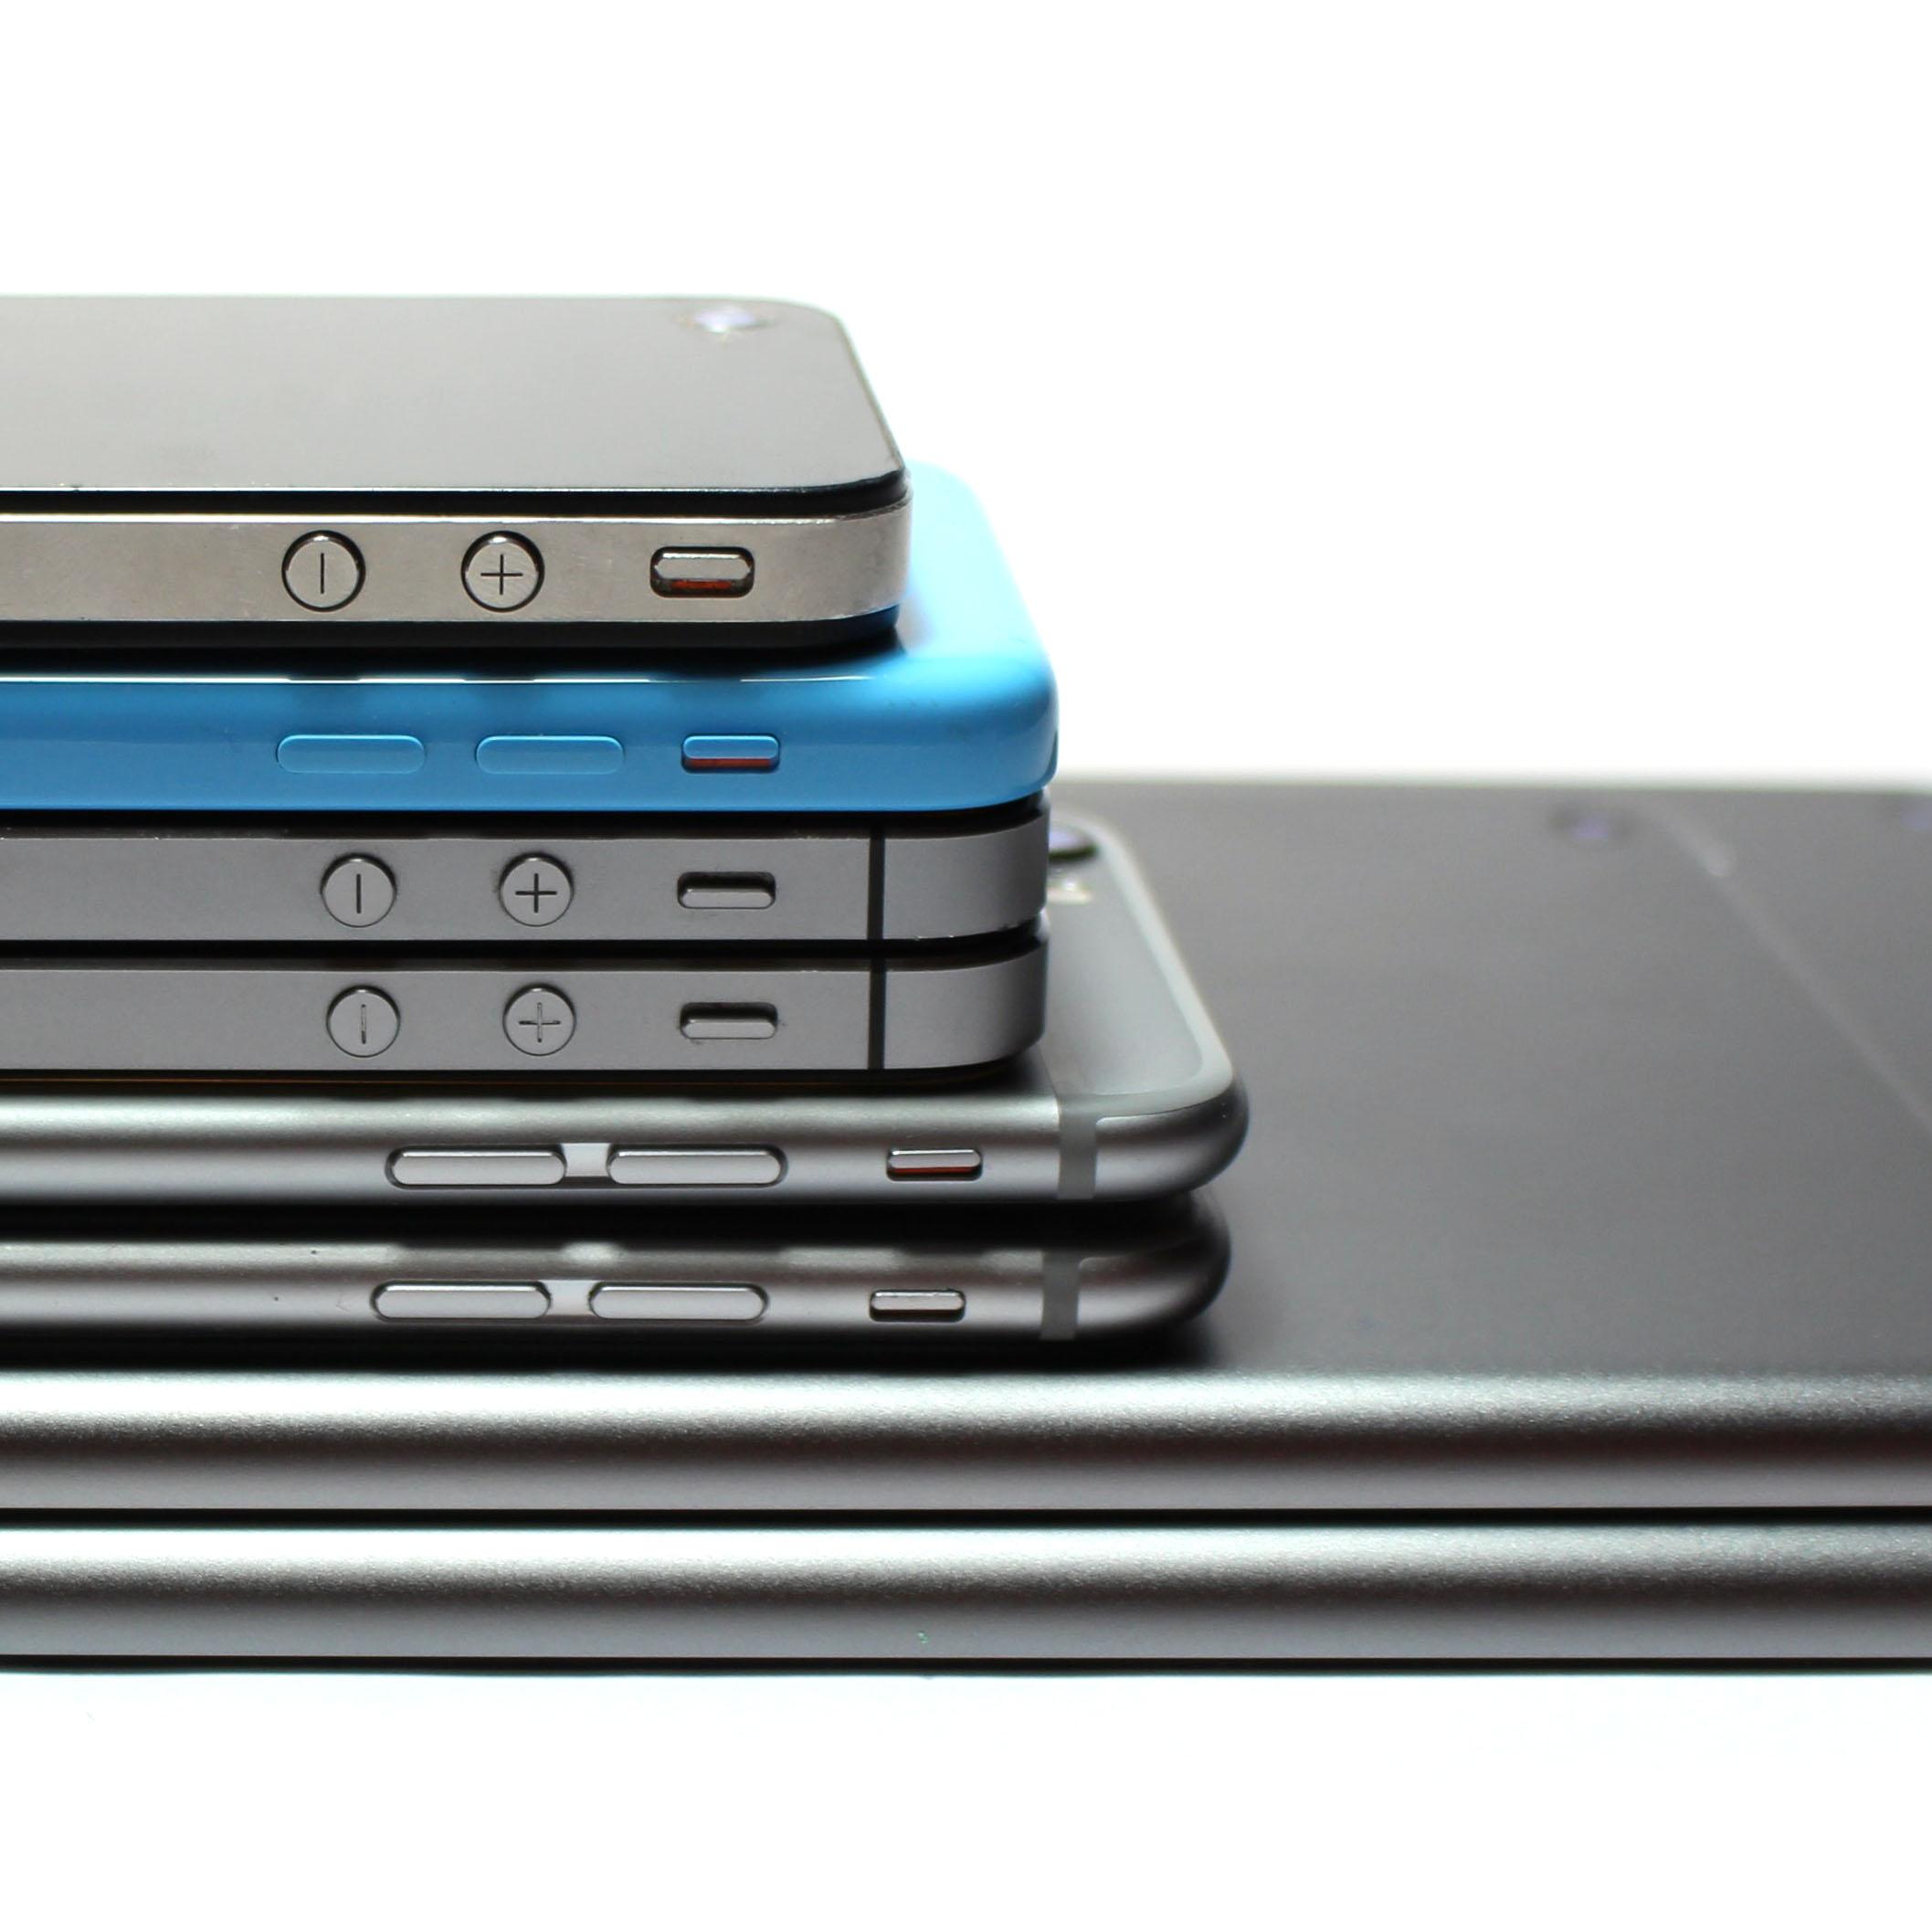 Alle Geräte